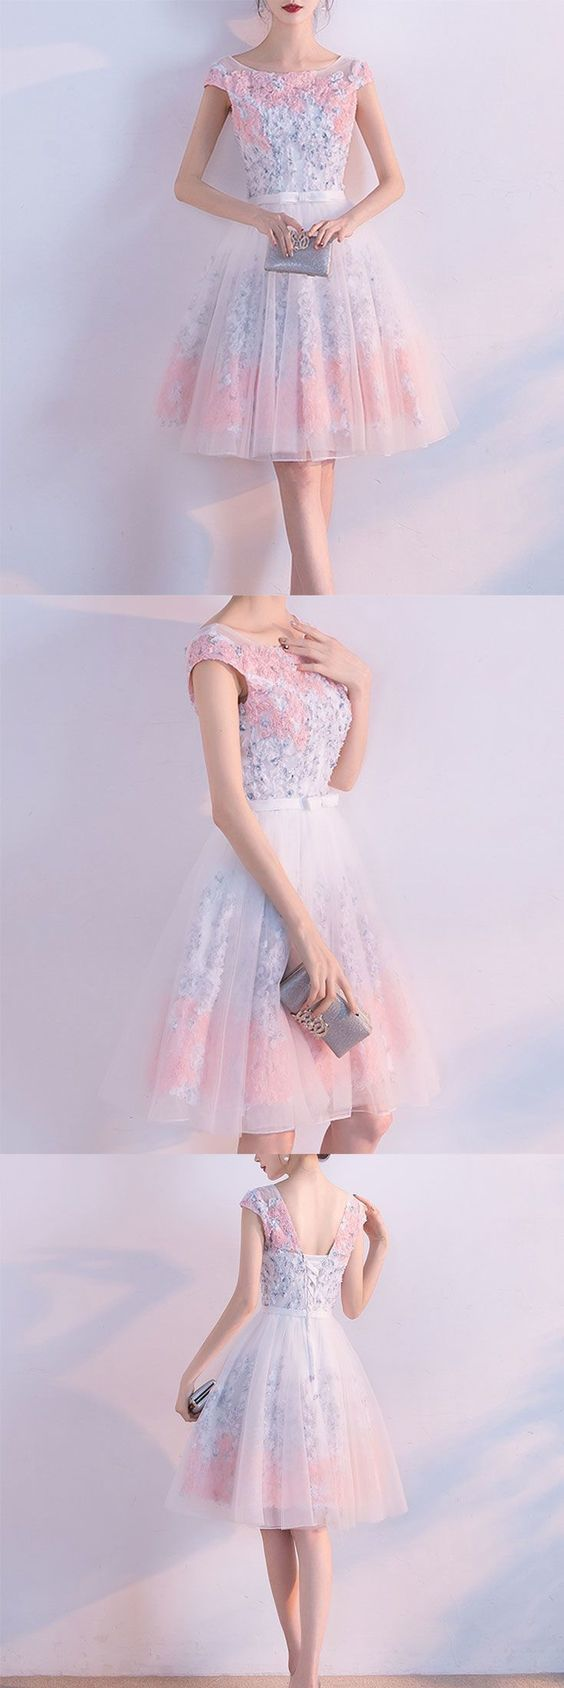 Little Cute | Cute A line short prom dress, homecoming dresses